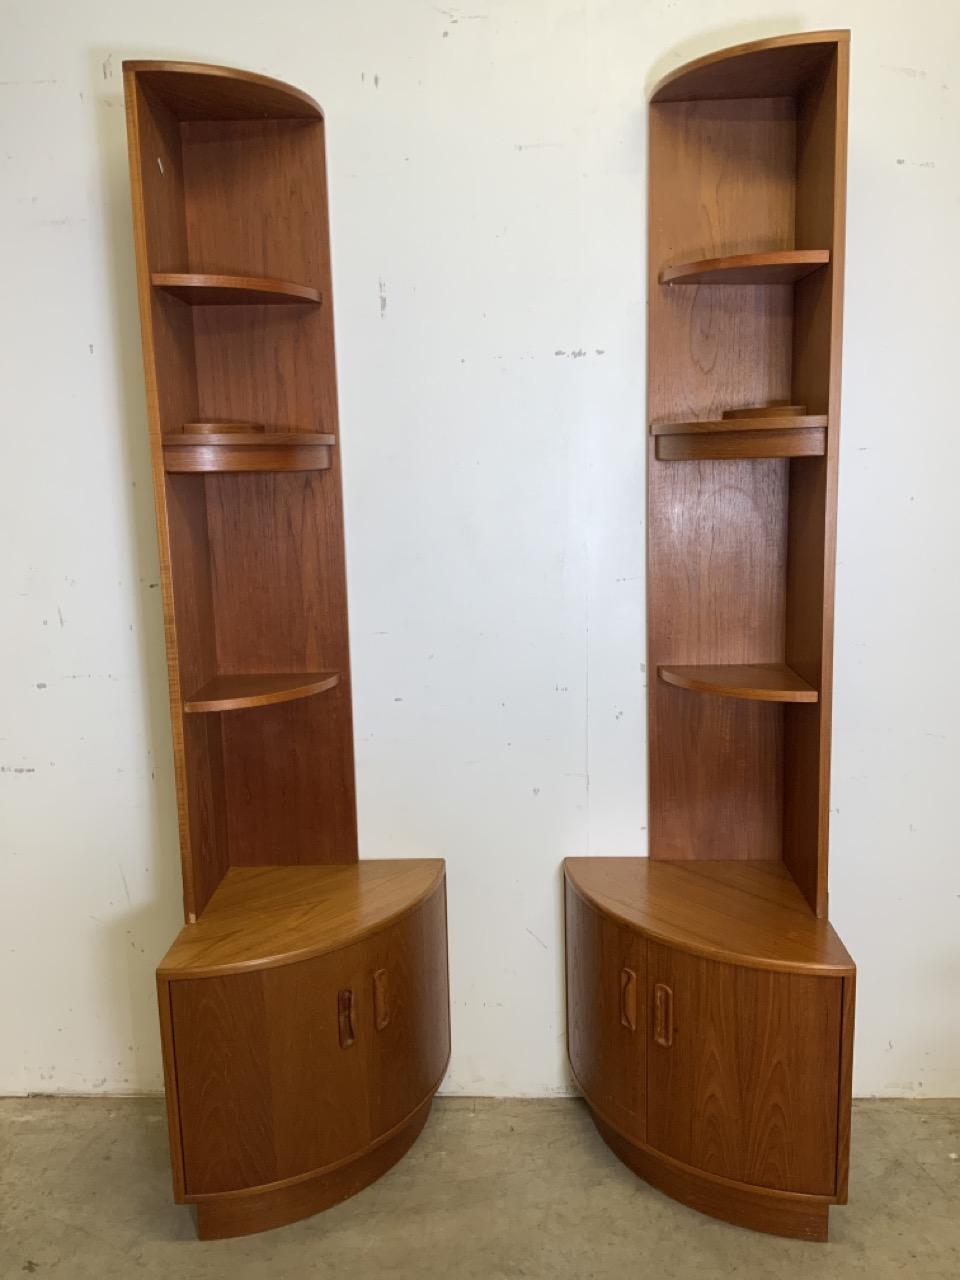 A pair of teak mid century G Plan two piece corner shelves with cupboards below. W:46cm x D:46cm x